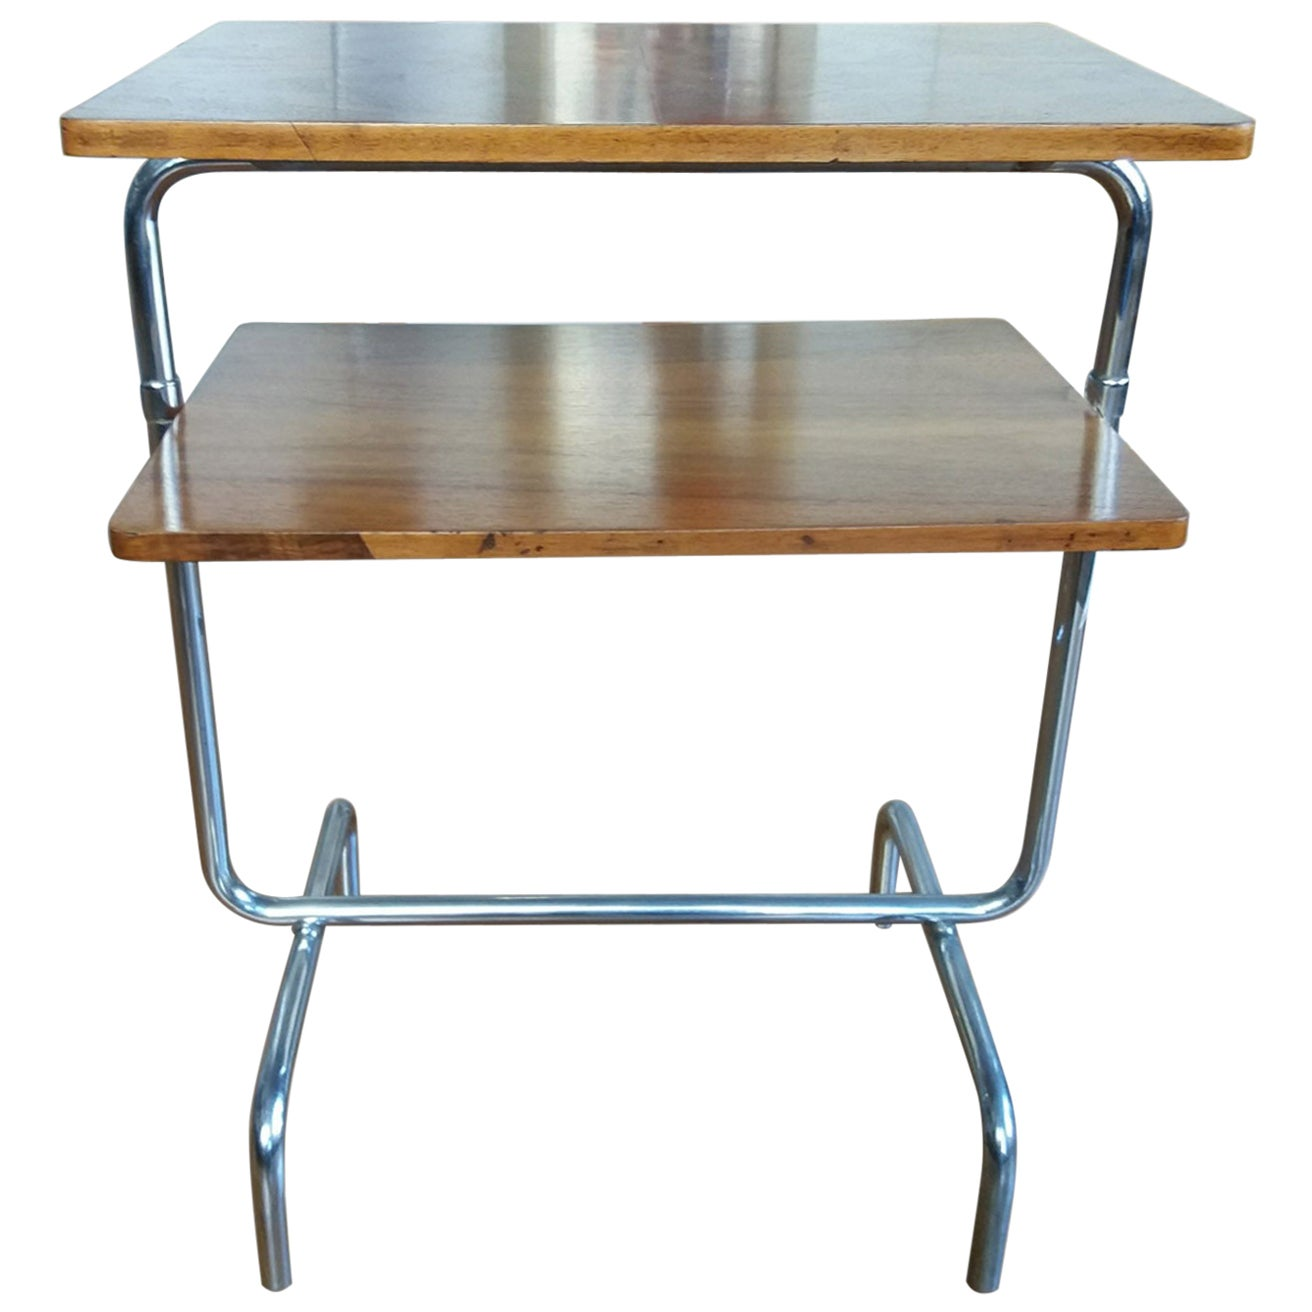 Bauhause Chromed Side Table in Walnut  Robert Slezak, 1930s, Bohemia